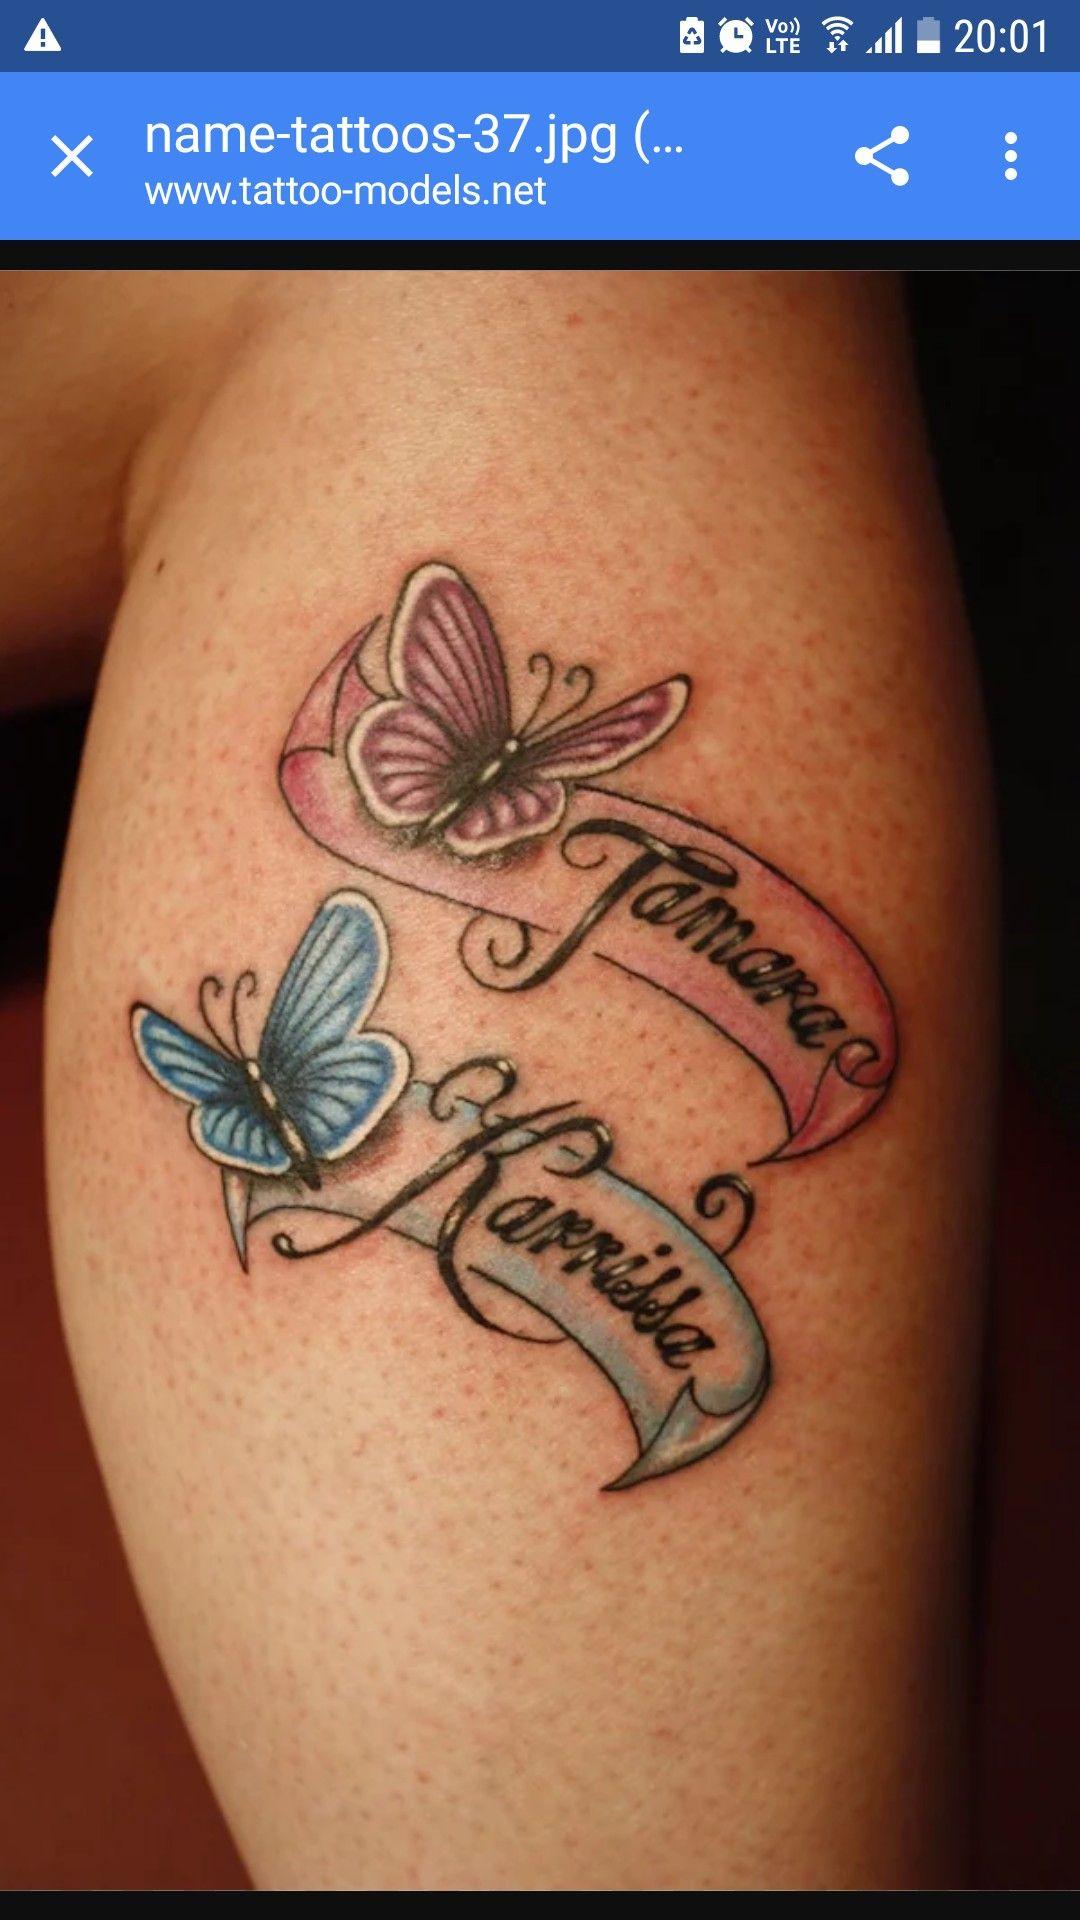 Tatuaggi braccio donne Milano - Tatuaggi Milano - Sailors